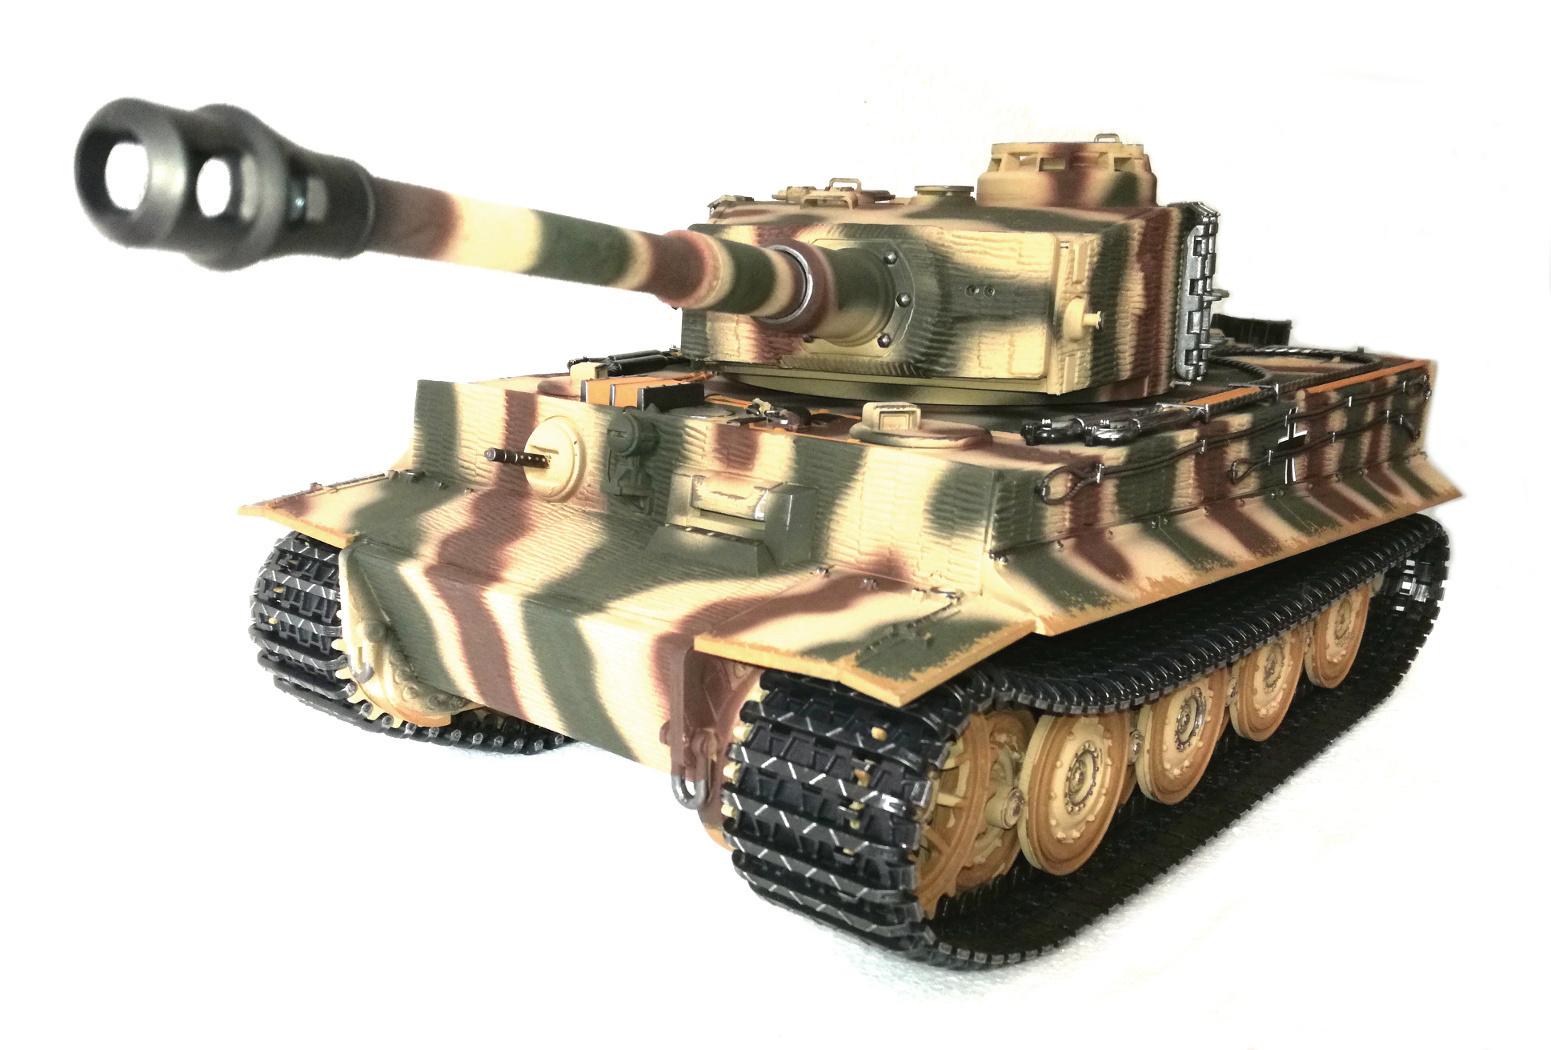 rc panzer tiger 1 1 16 rauch sound bb rrz metallketten. Black Bedroom Furniture Sets. Home Design Ideas